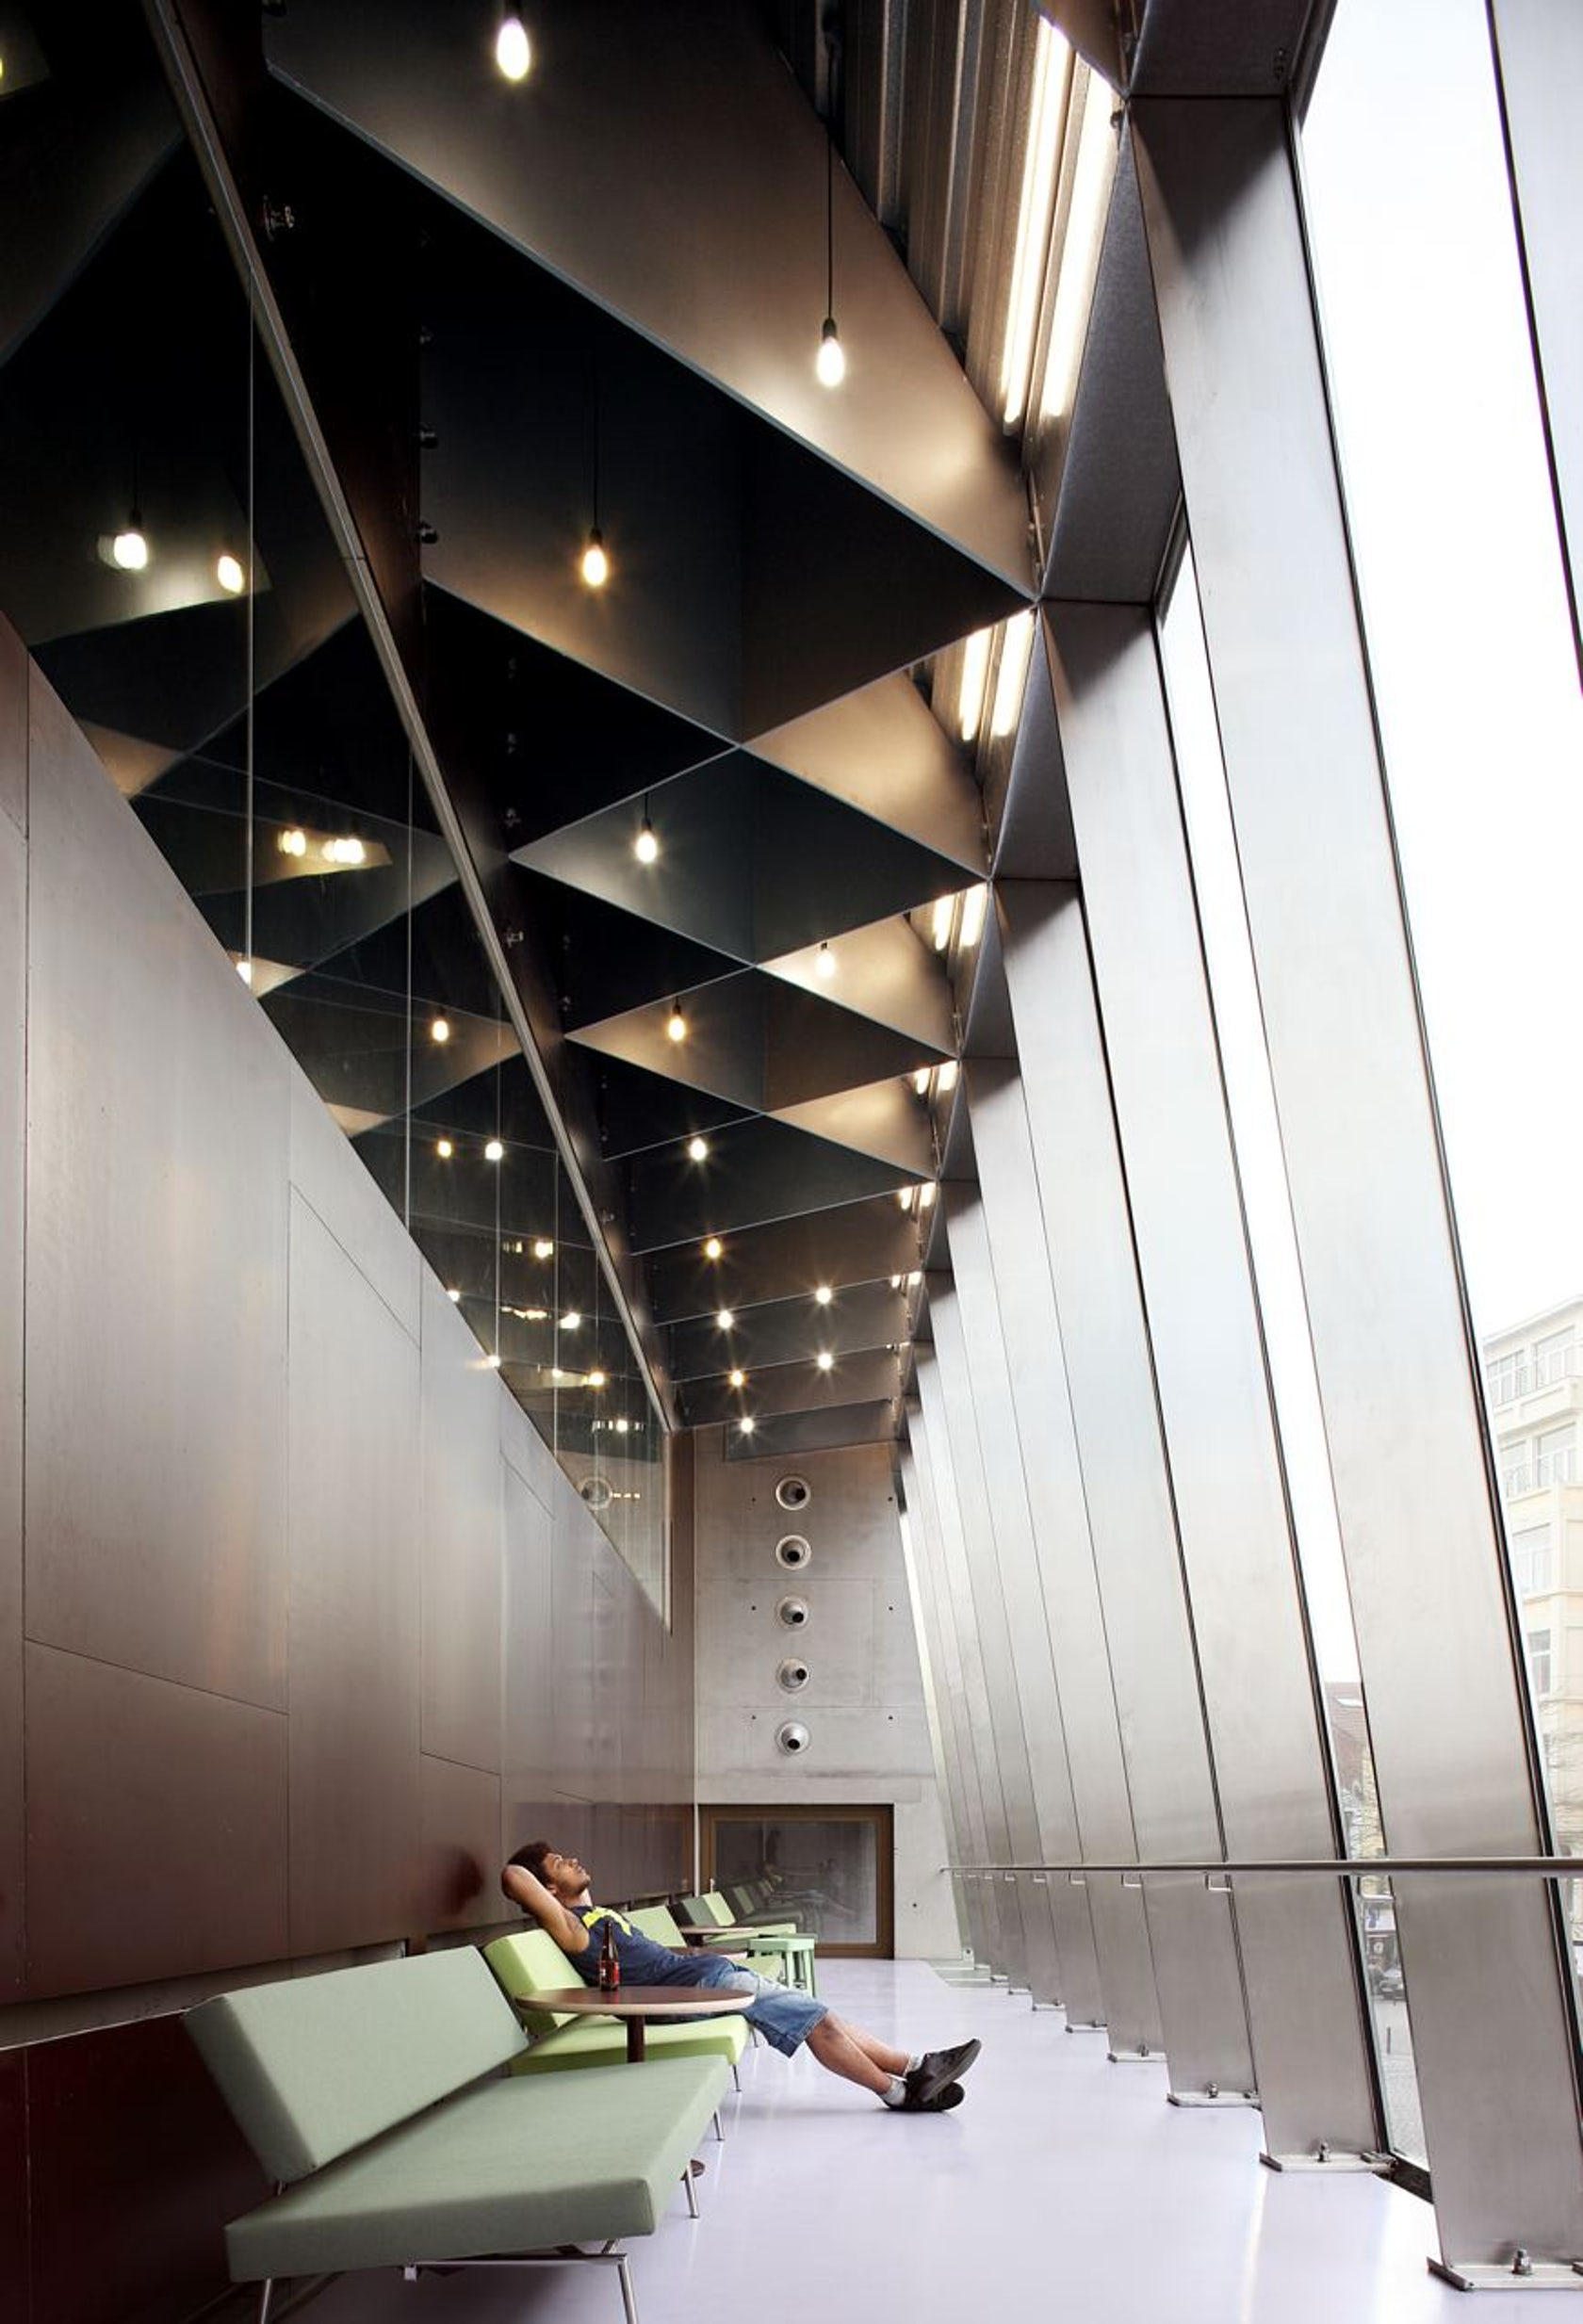 Bronks jeugdtheater architizer for Interior architectural lighting